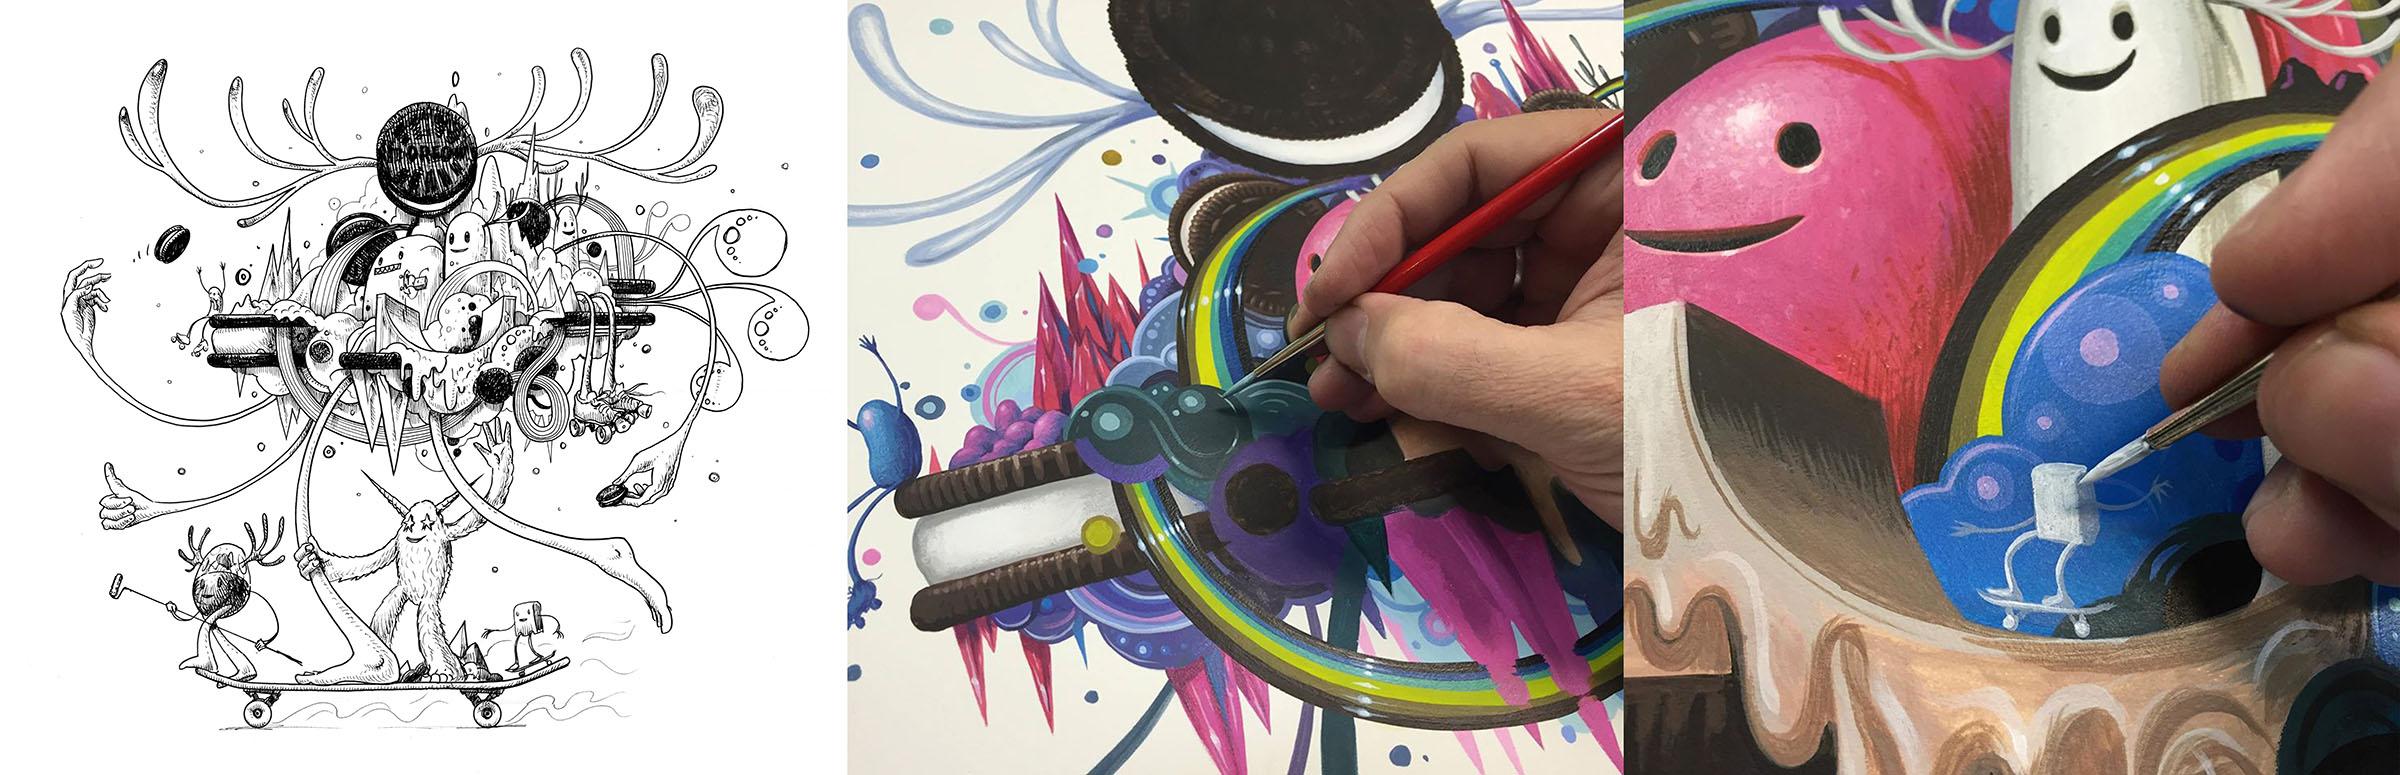 Jeff Soto artist process images